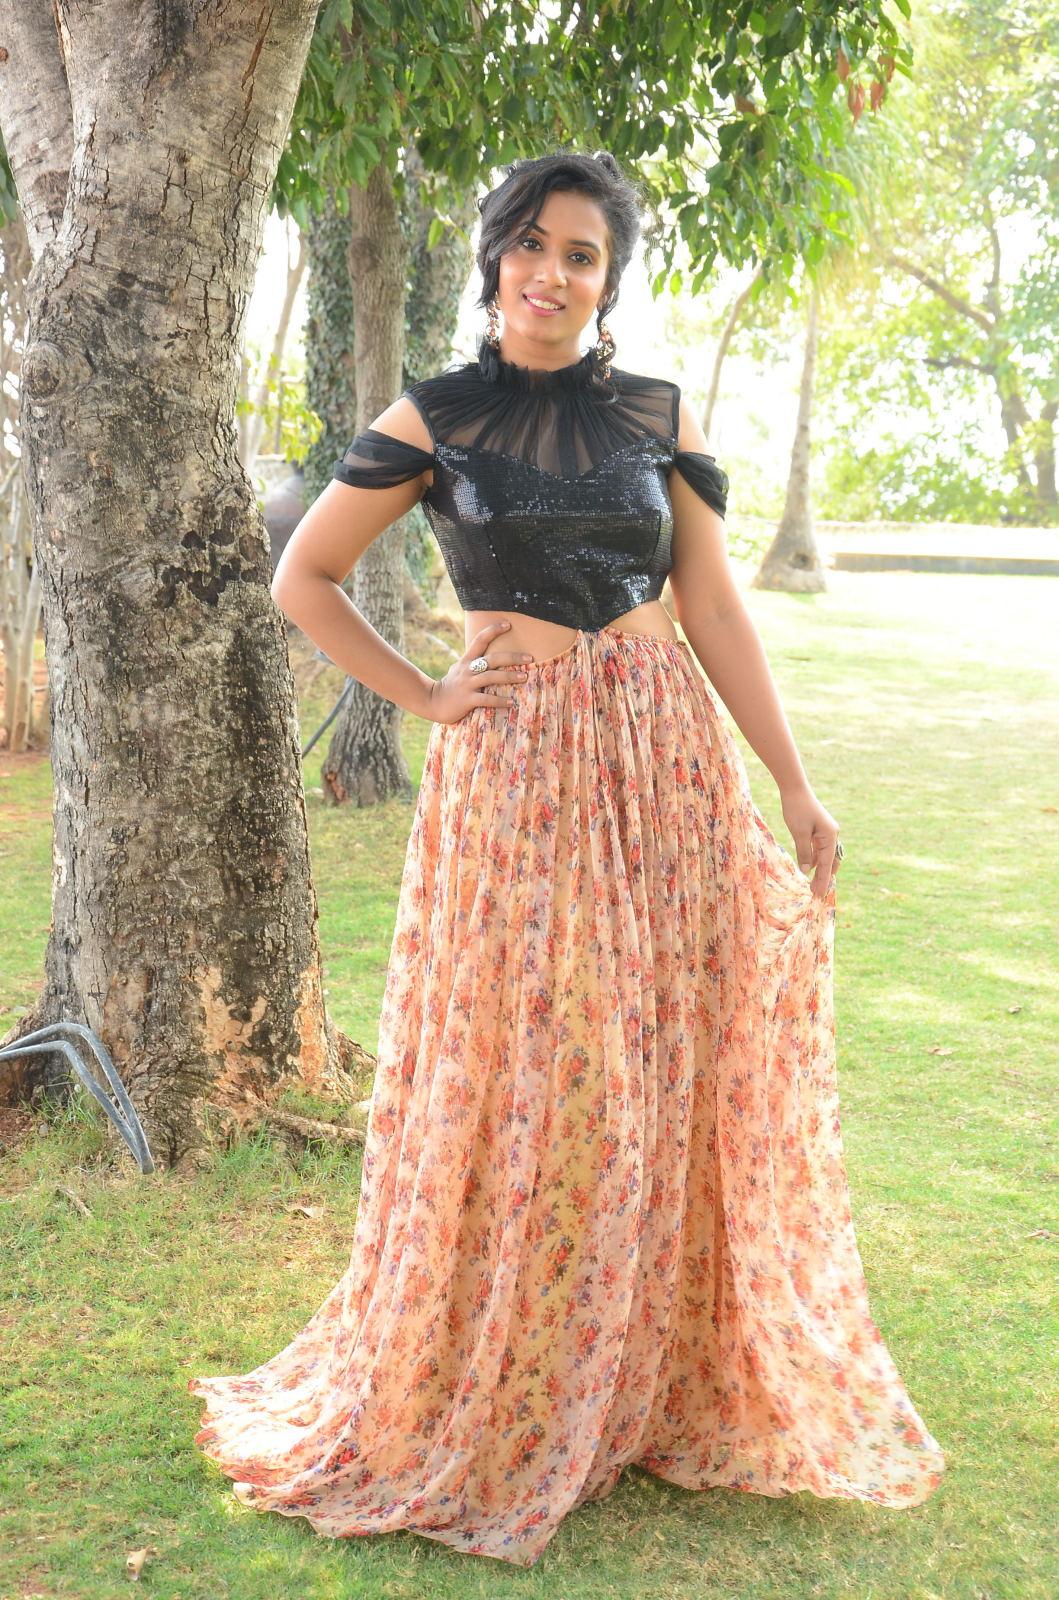 chetana uttej Brand New Photo Stills Of South Actress Chetana Uttej | Tollywood Chetana Uttej 2